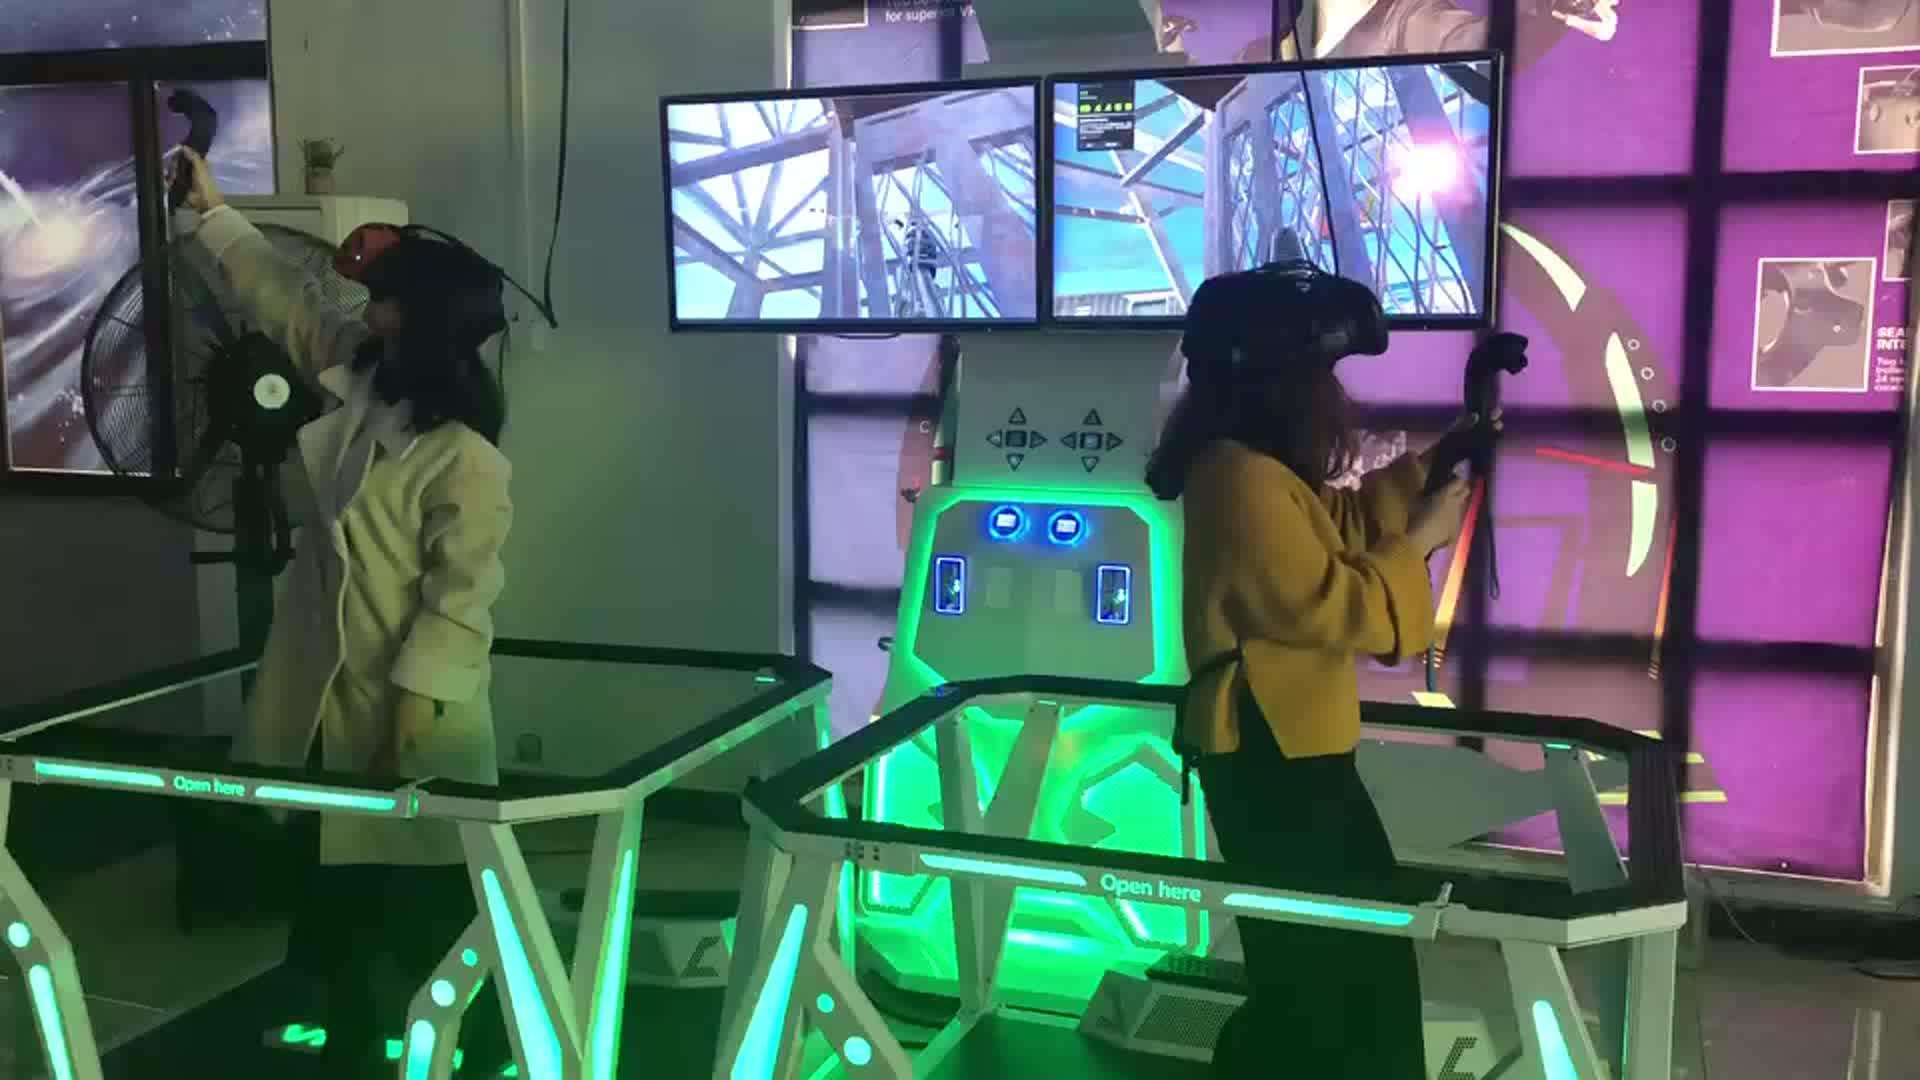 vr venue 9d game console target arcade shooting simulator 9d htc vive vr station